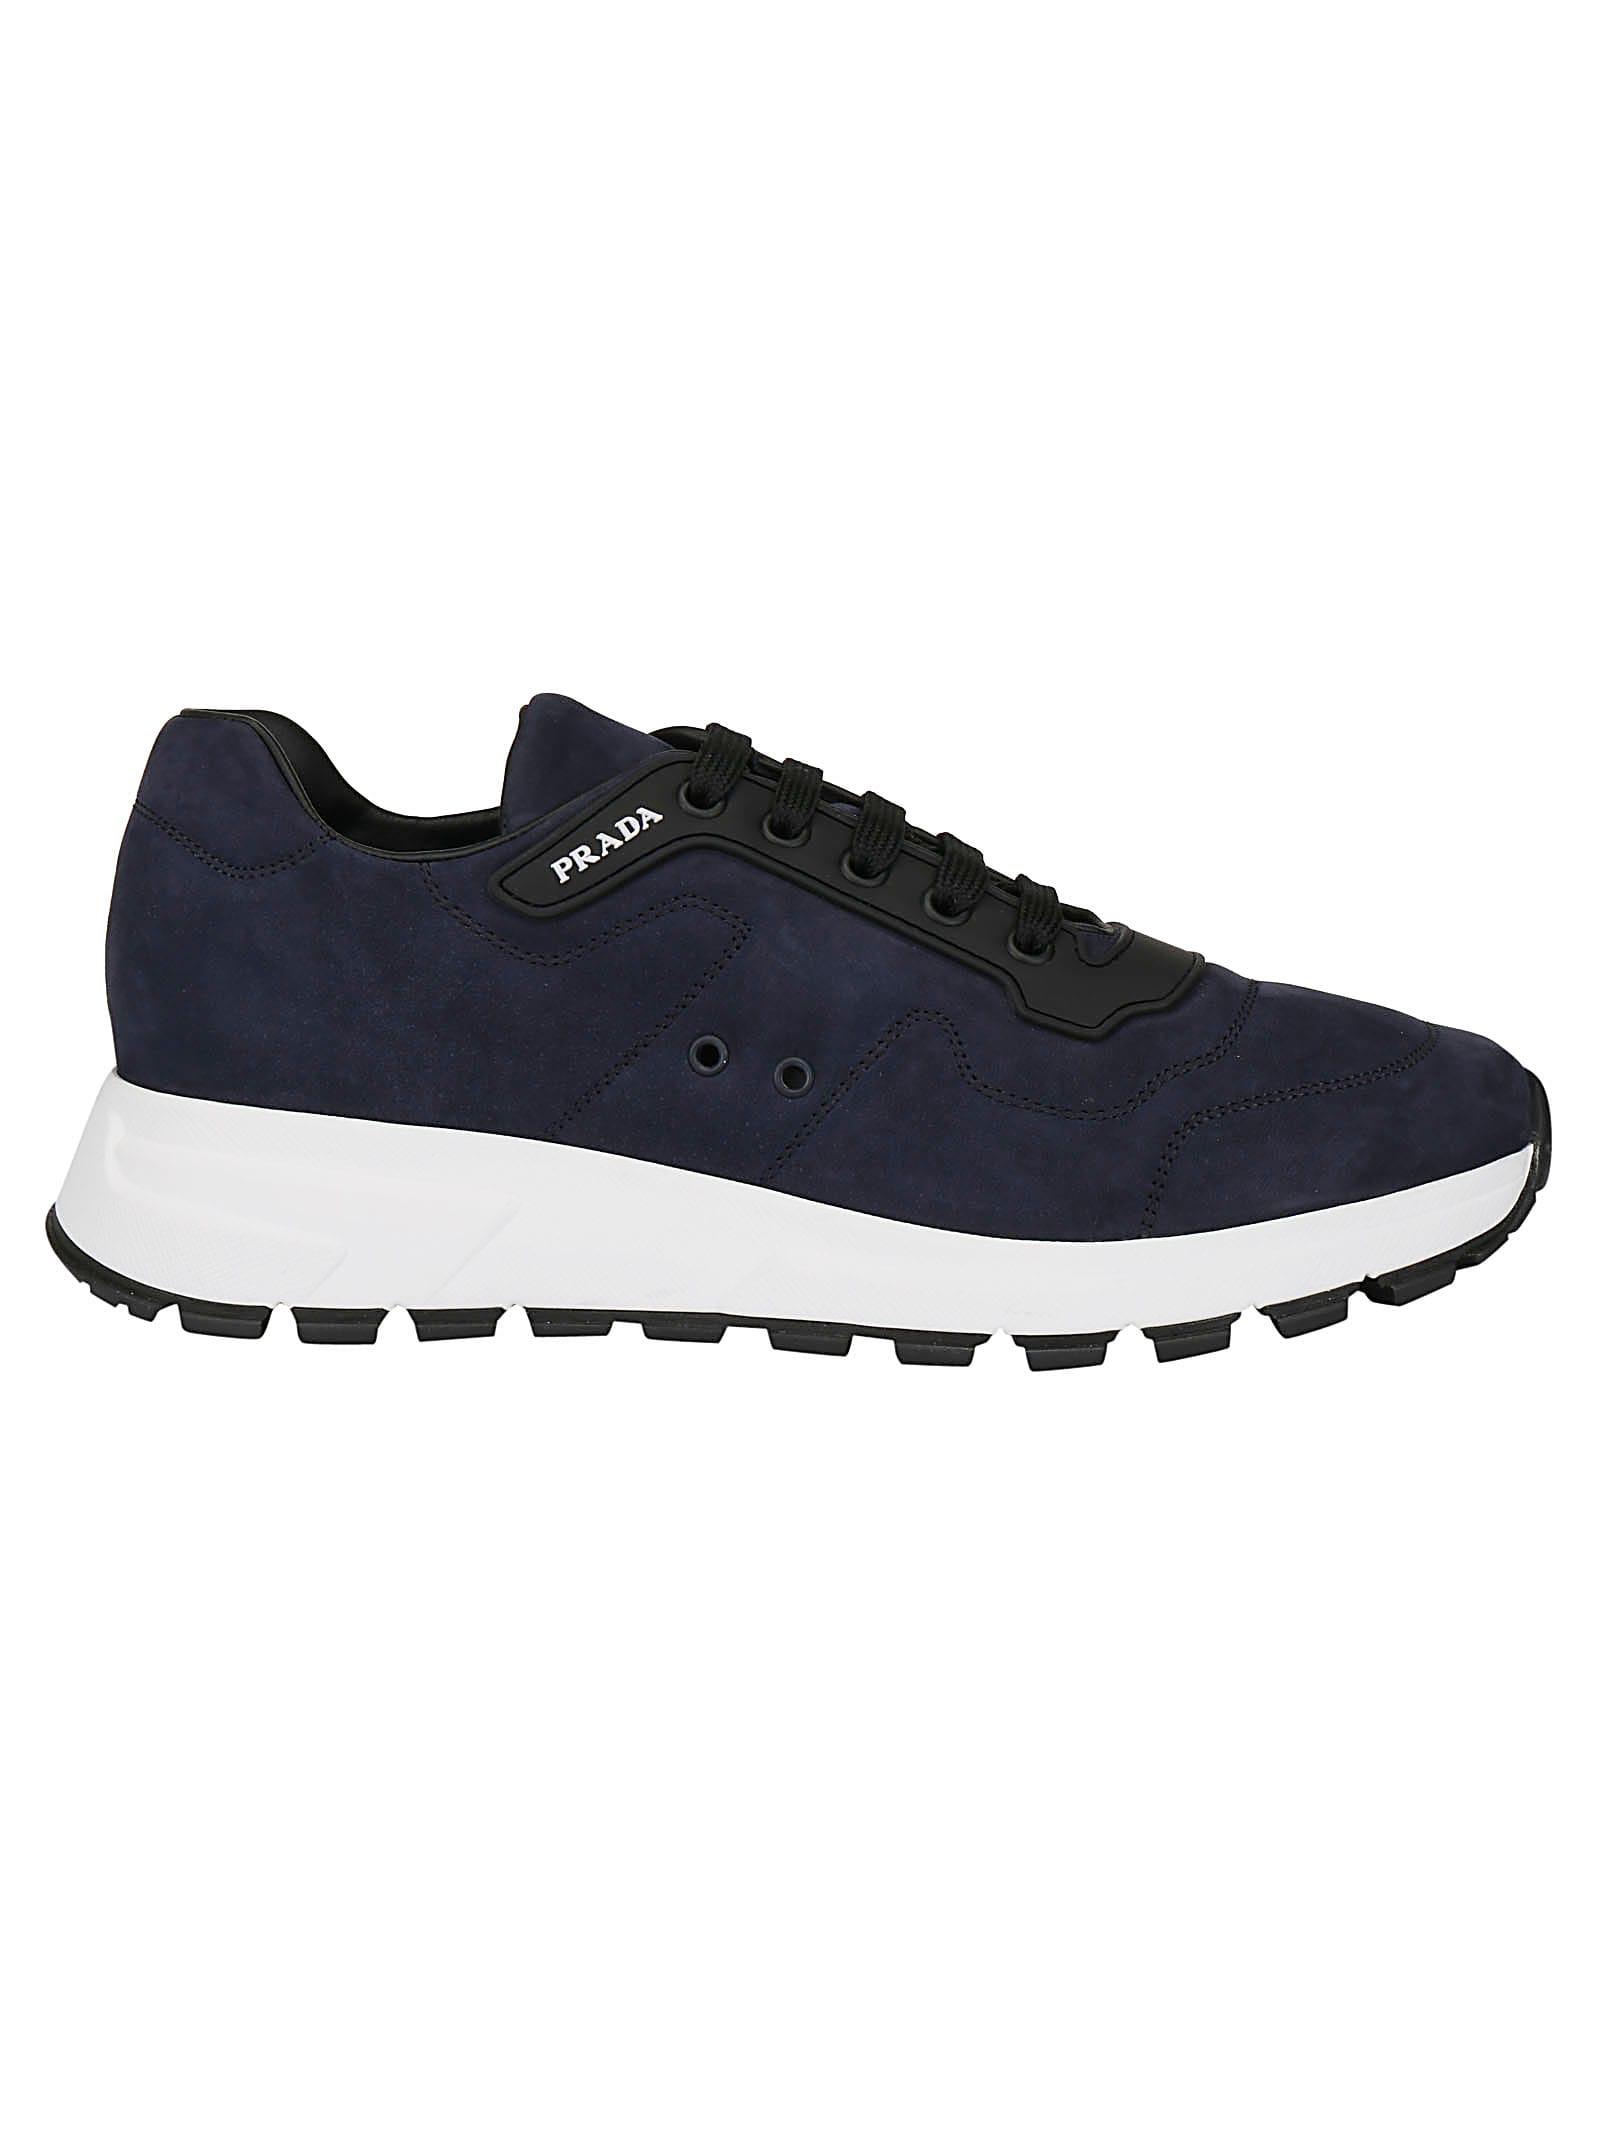 on sale ae242 fd4ed Prada Prax 01 Sneakers